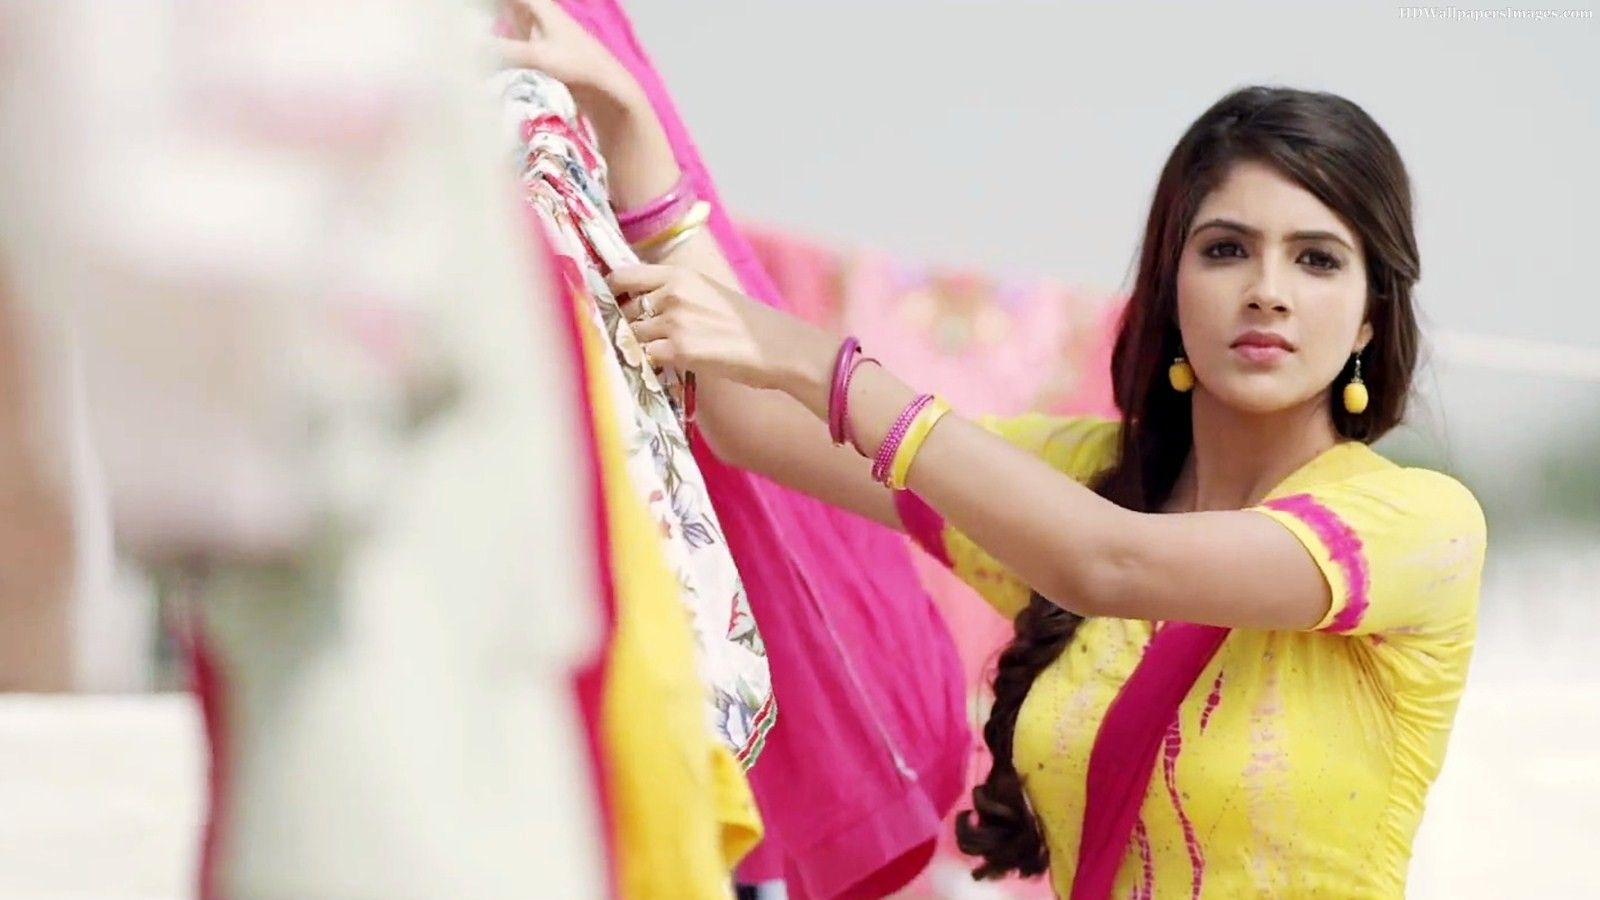 Beautiful Punjabi Girls Wallpapers And Pictures Cool Wallpapers For Girls Little Girl Pictures Punjabi Girls